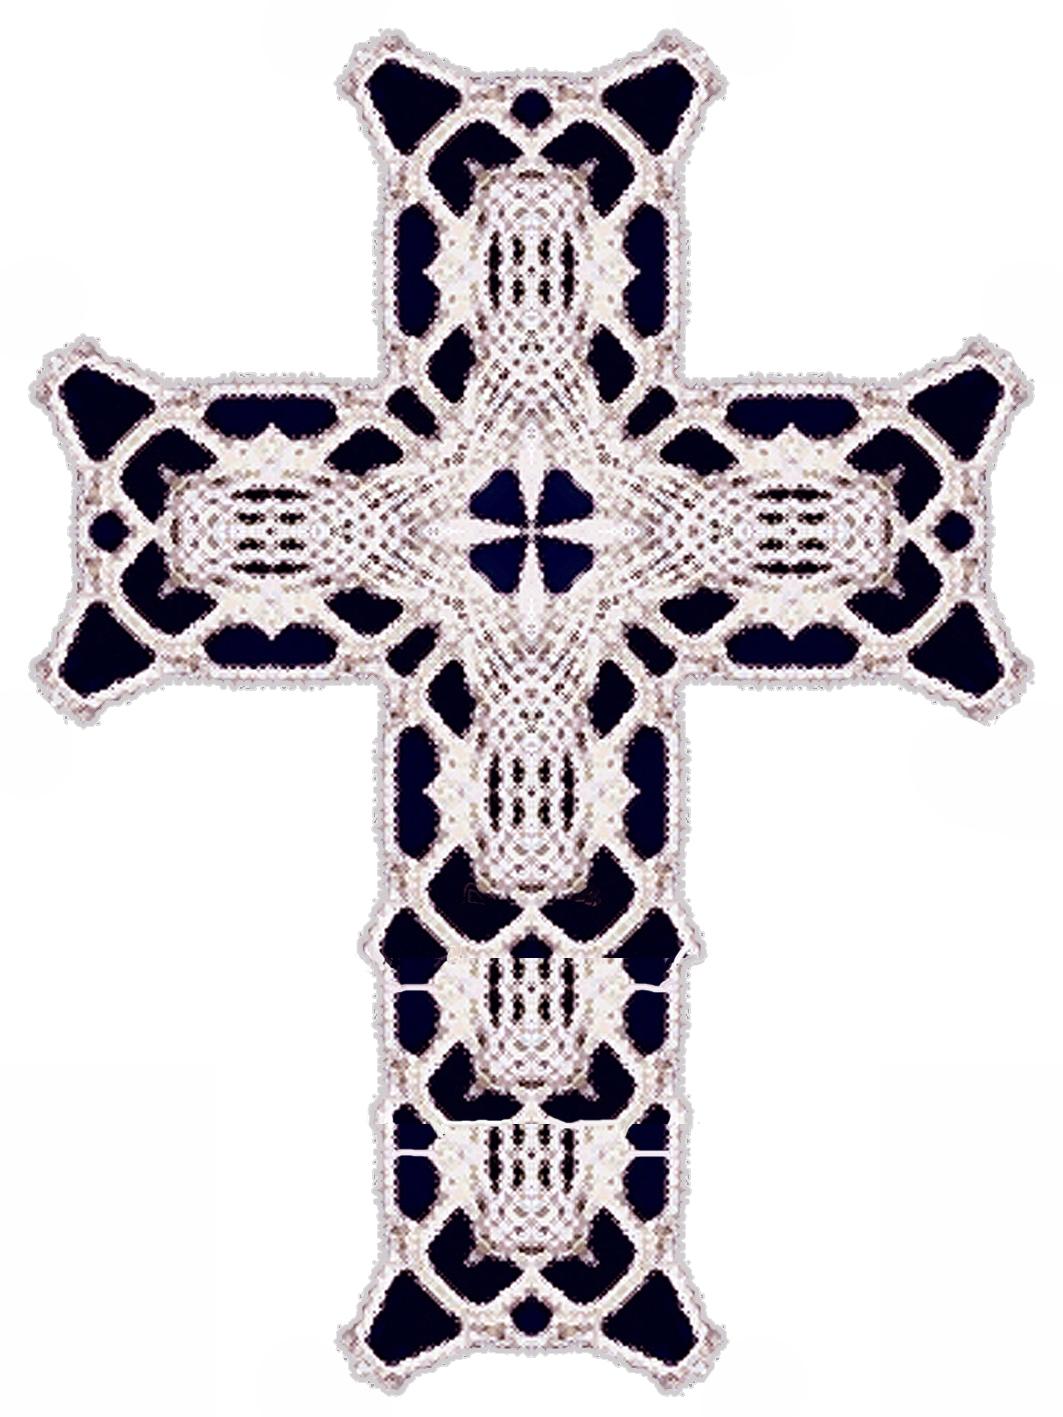 ArtbyJean - Easter Clip Art: Lace desin on an Easter ... (1063 x 1417 Pixel)